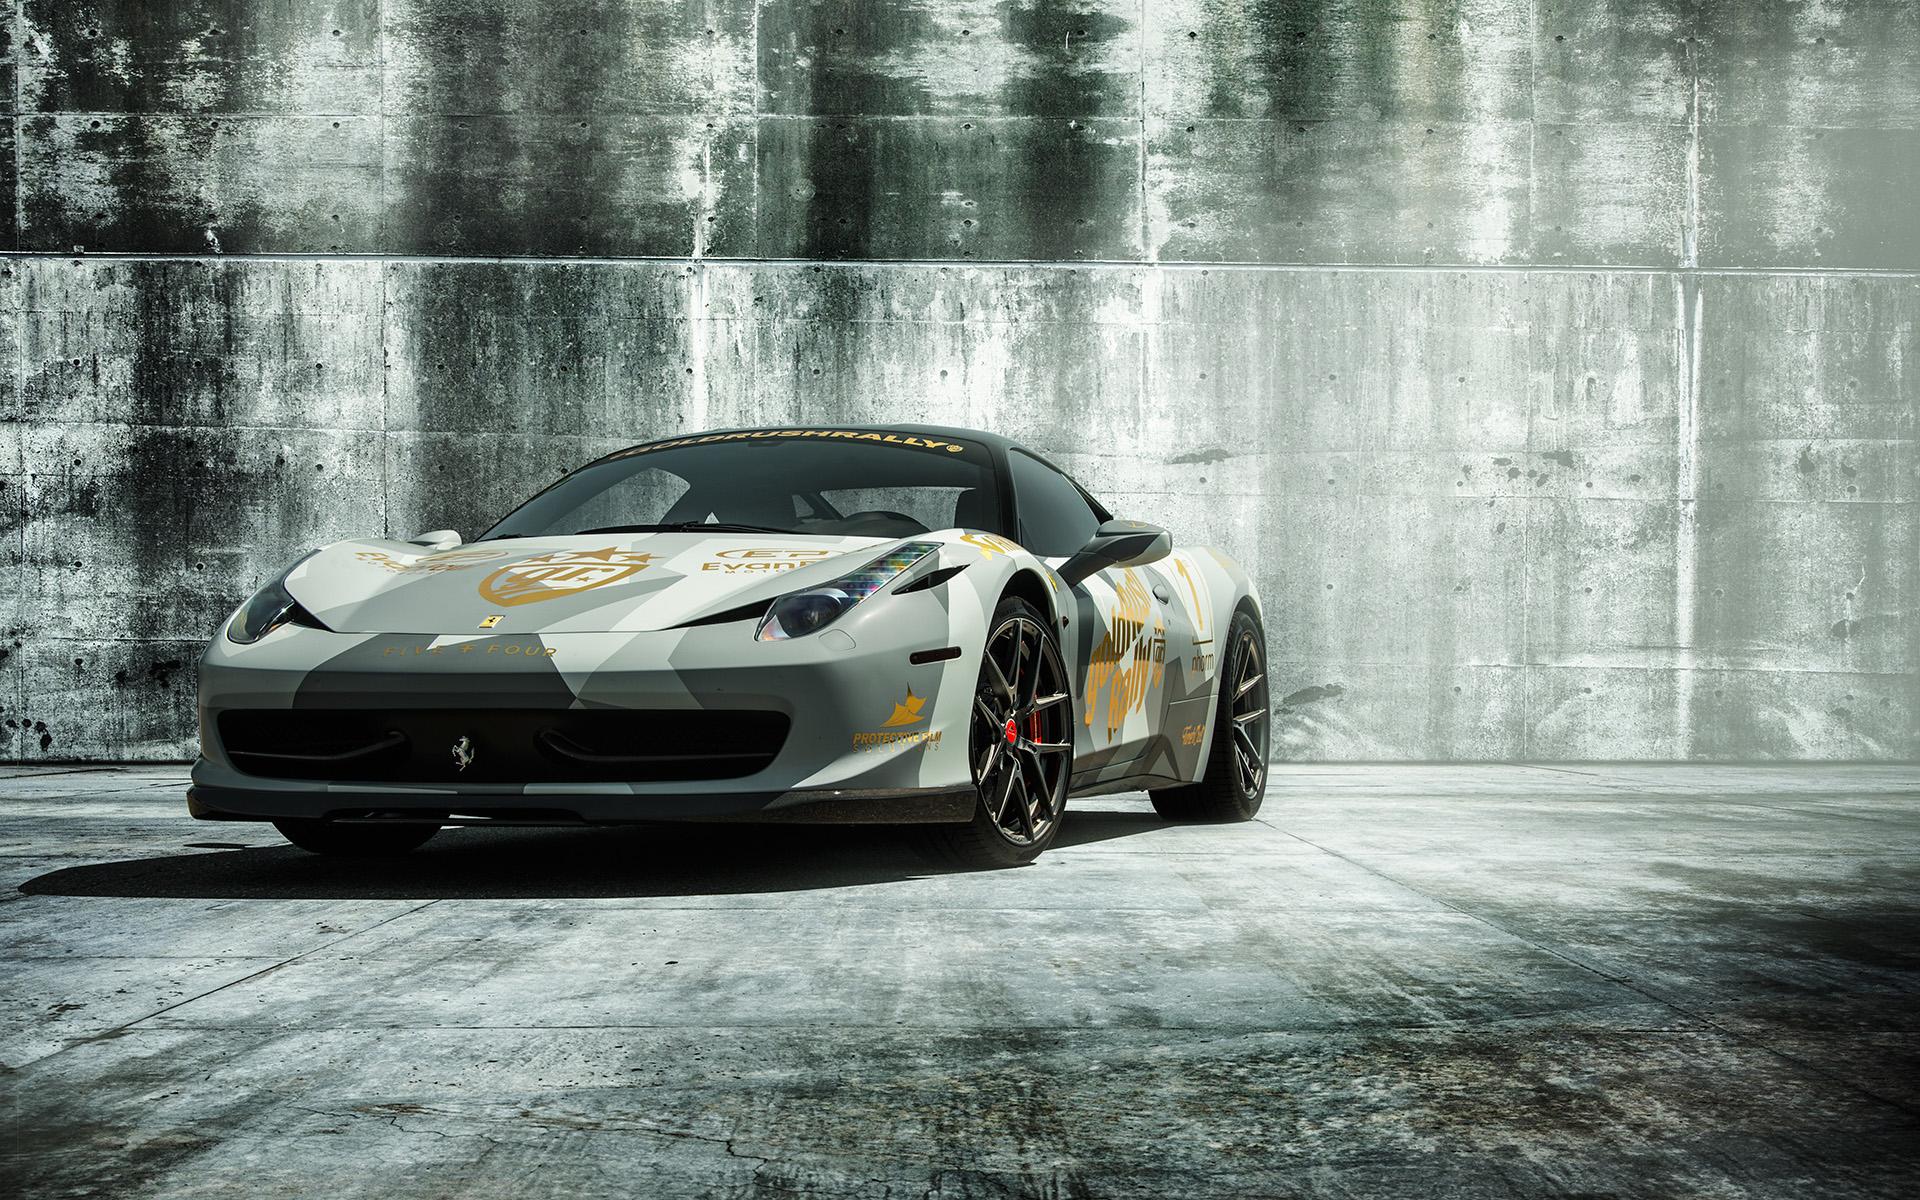 2016 vorsteiner ferrari 458 italia aero wallpaper hd car wallpapers 2016 vorsteiner ferrari 458 italia aero vanachro Gallery